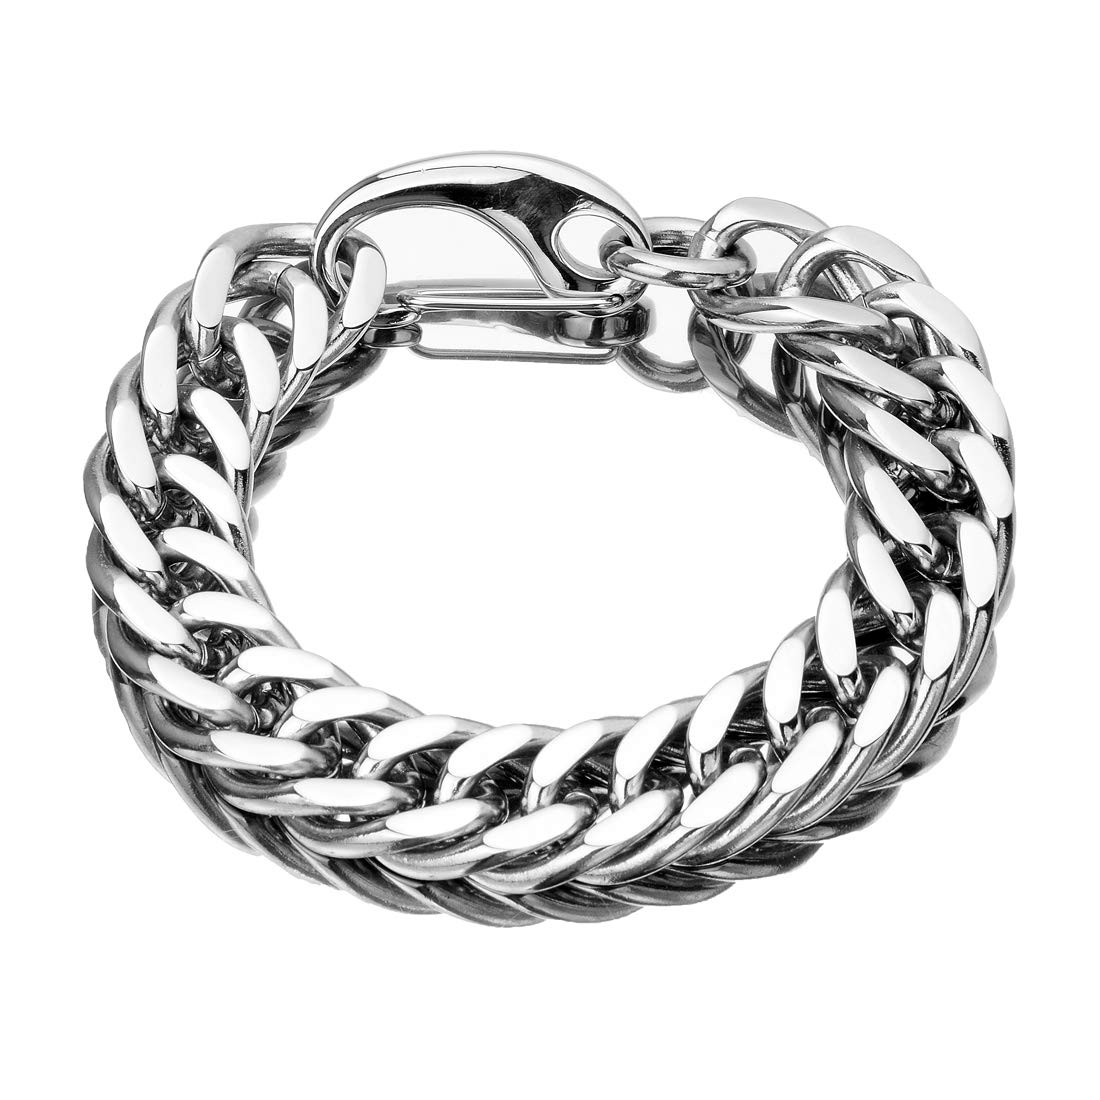 TIASRI Heavy Mens Necklace Stainless Steel Xxxtentacion Necklace Chain Double Cuban Miami Link Choker 24